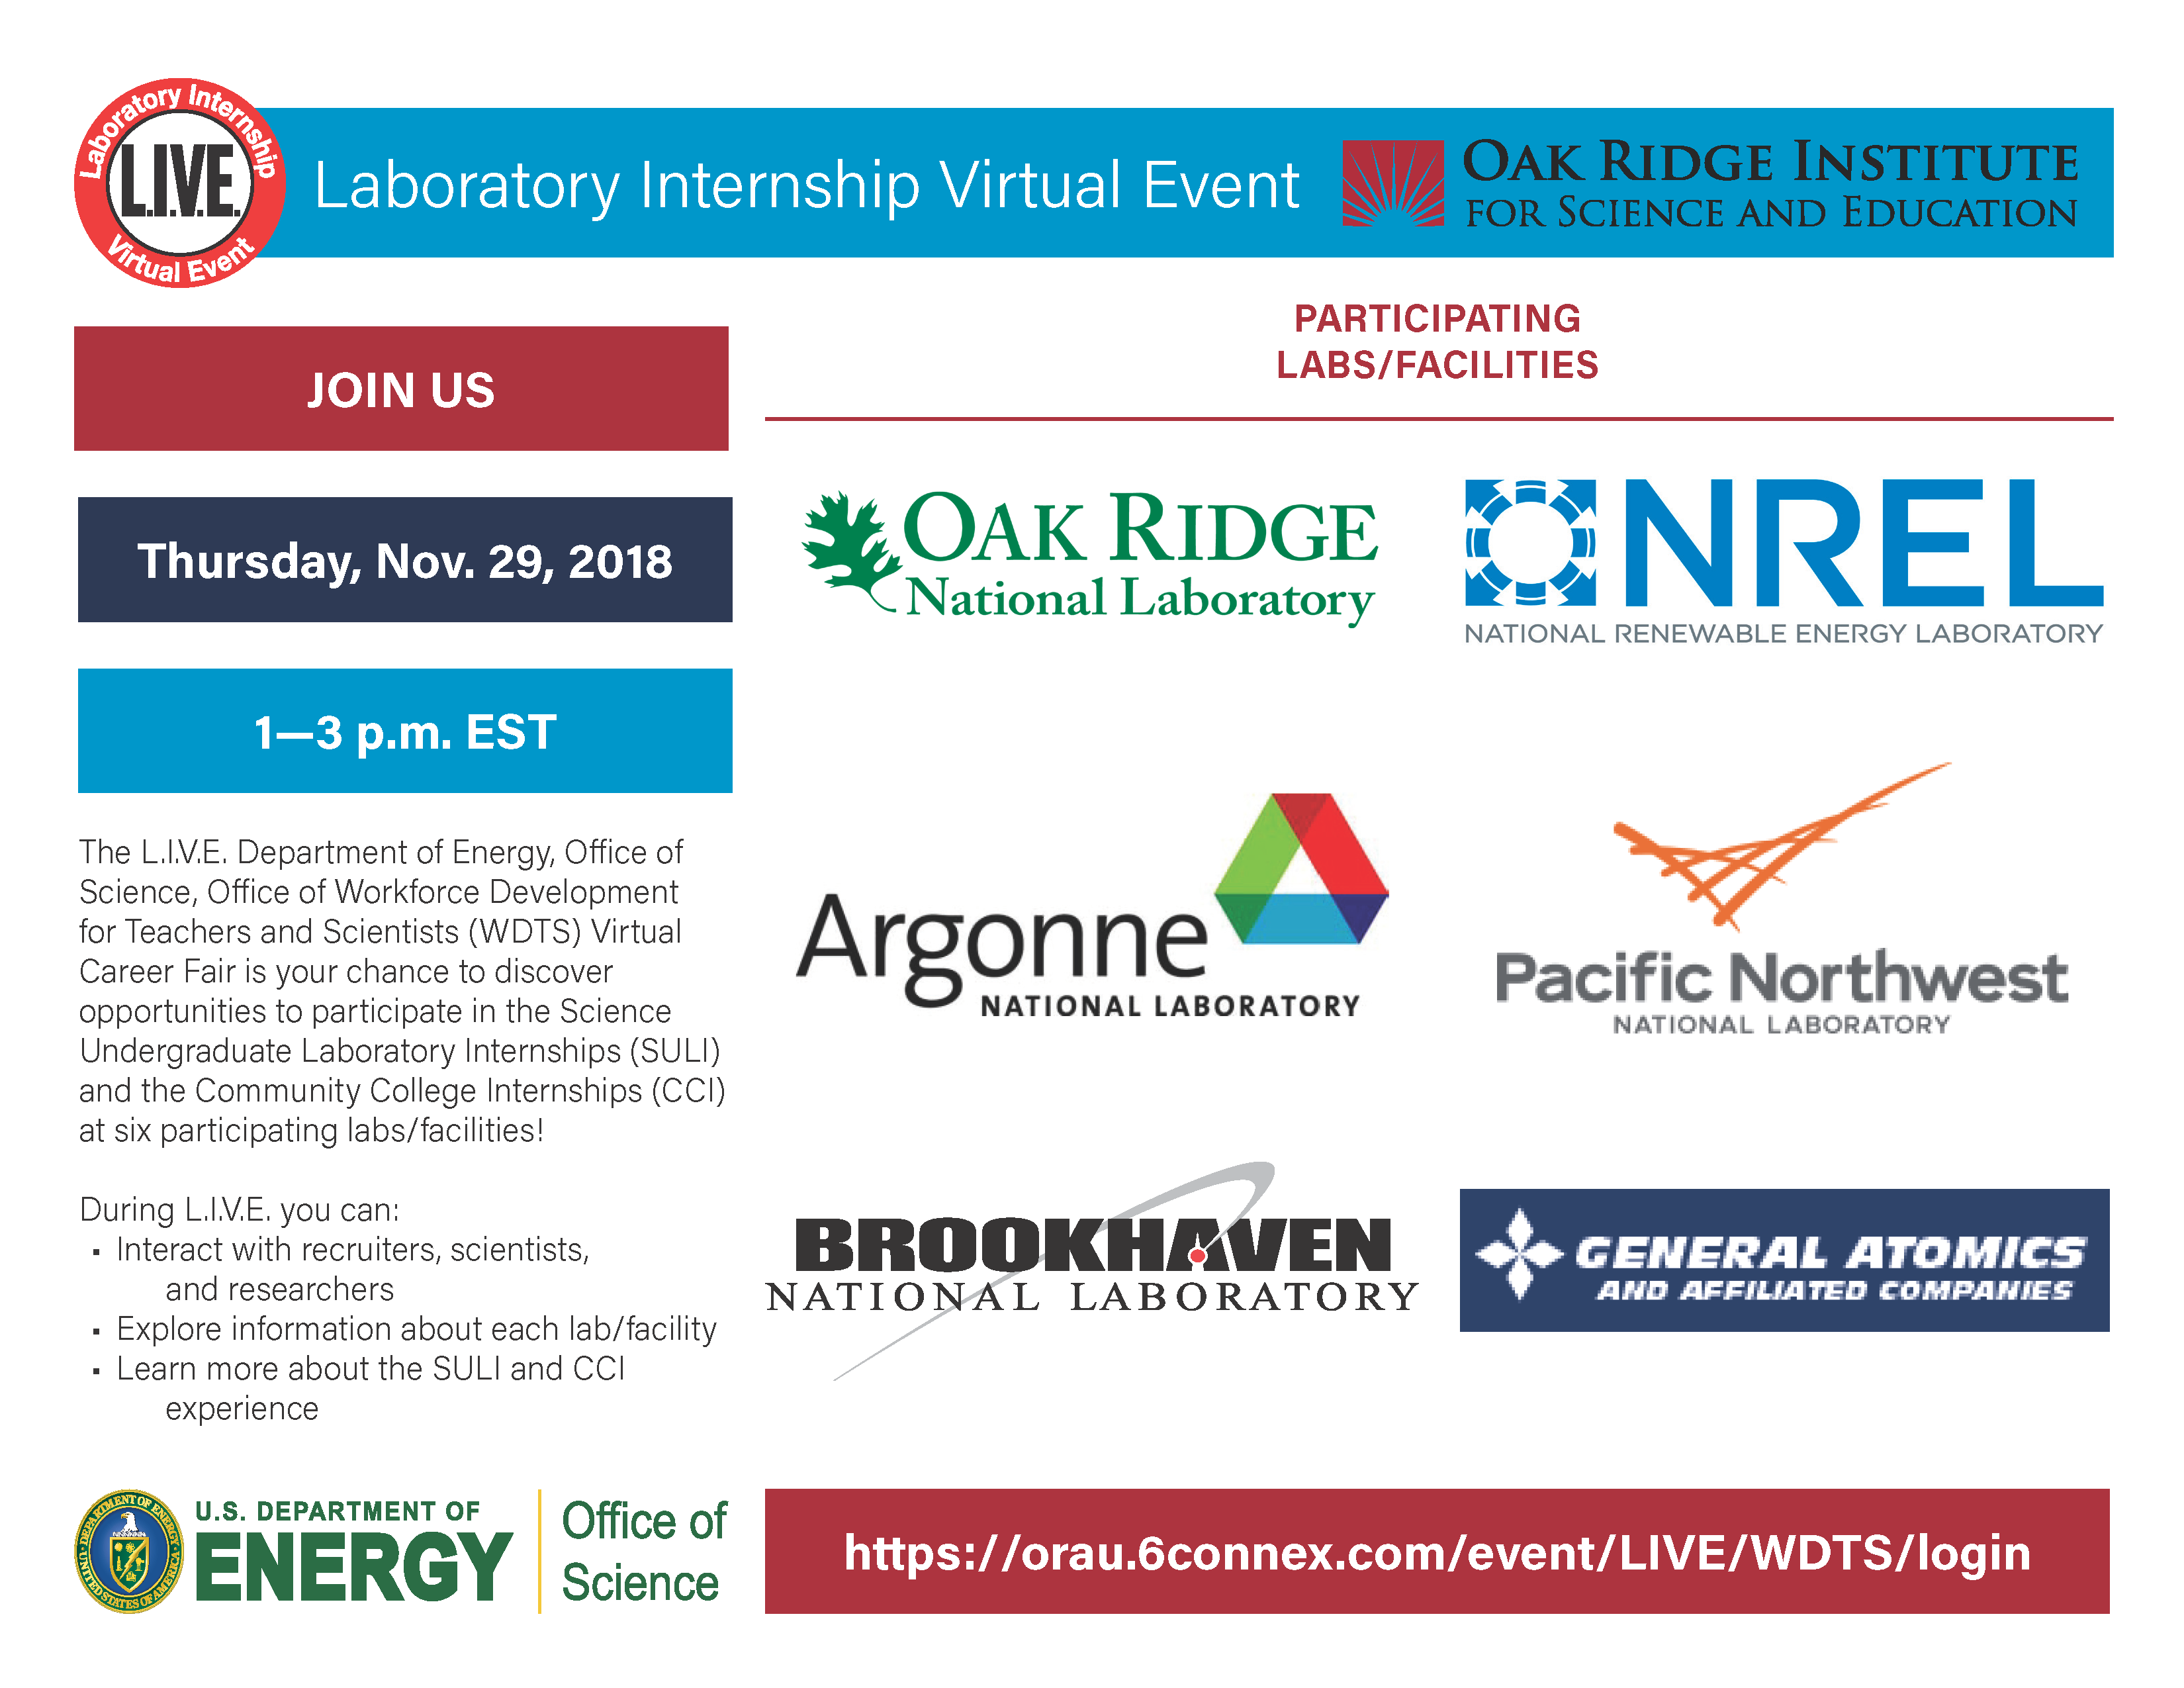 Laboratory Internship Virtual Career Fair C2d2 Georgia